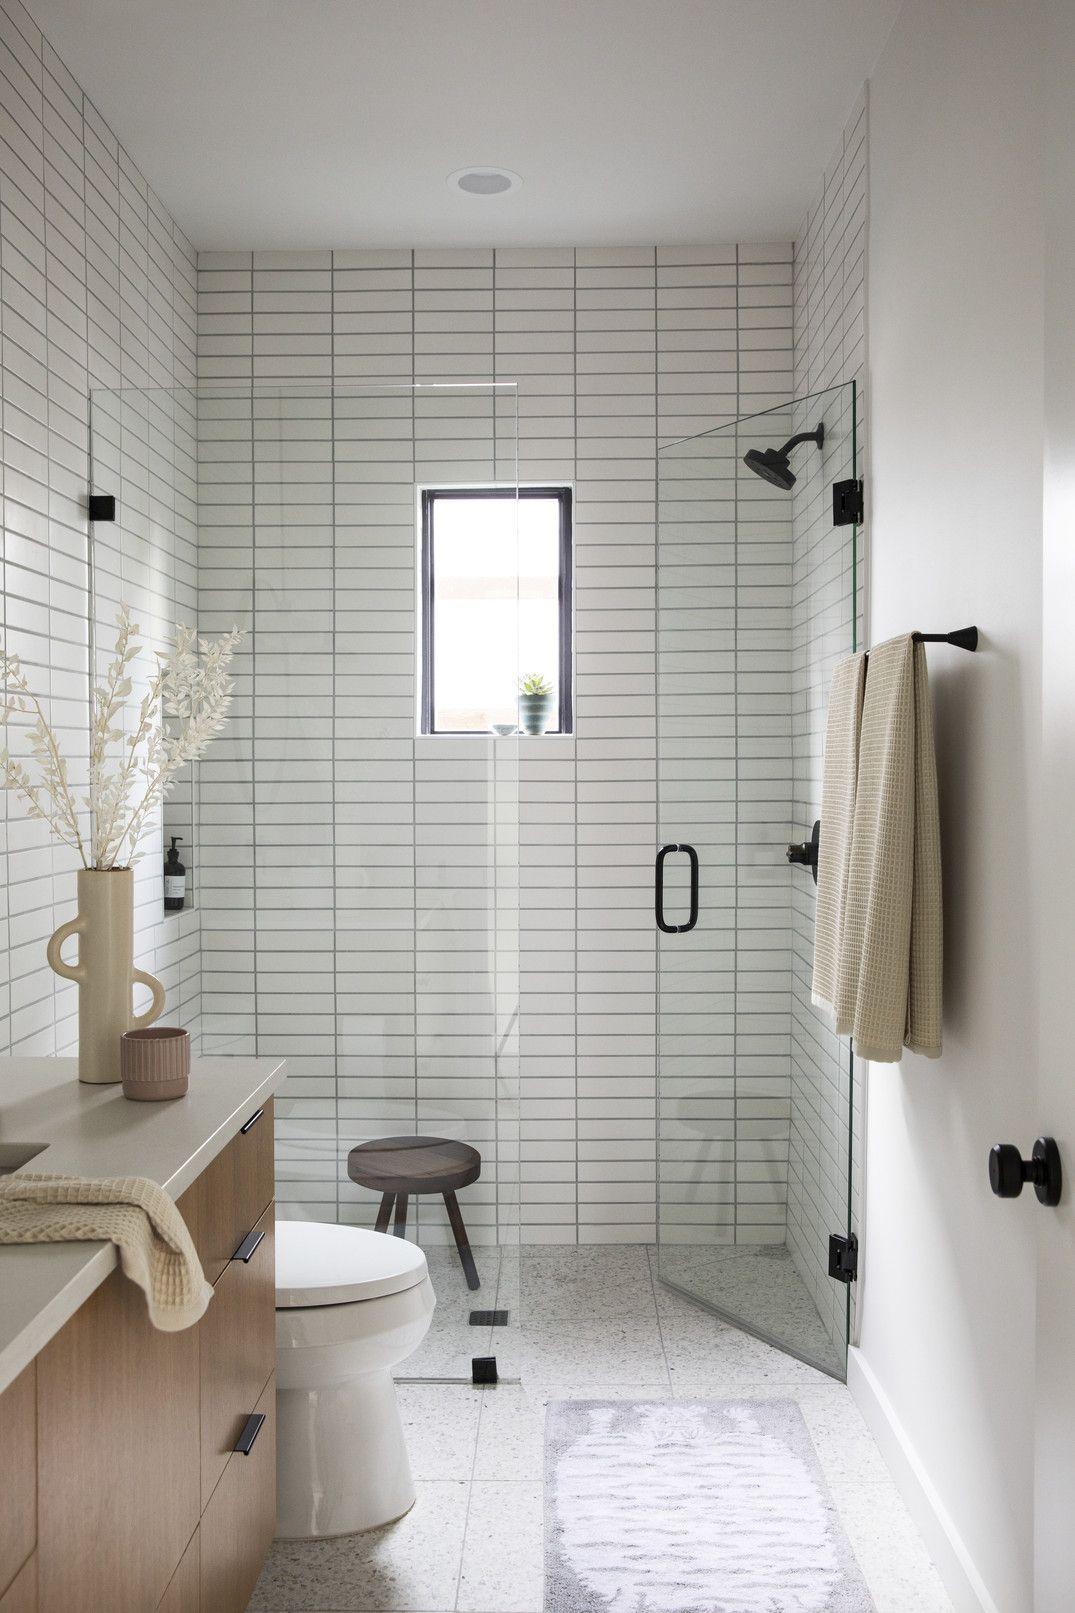 Our West Elm Bedroom And Bathroom Collaboration The Effortless Chic Bathroom Renovation Diy Diy Bathroom Makeover Diy Bathroom Remodel